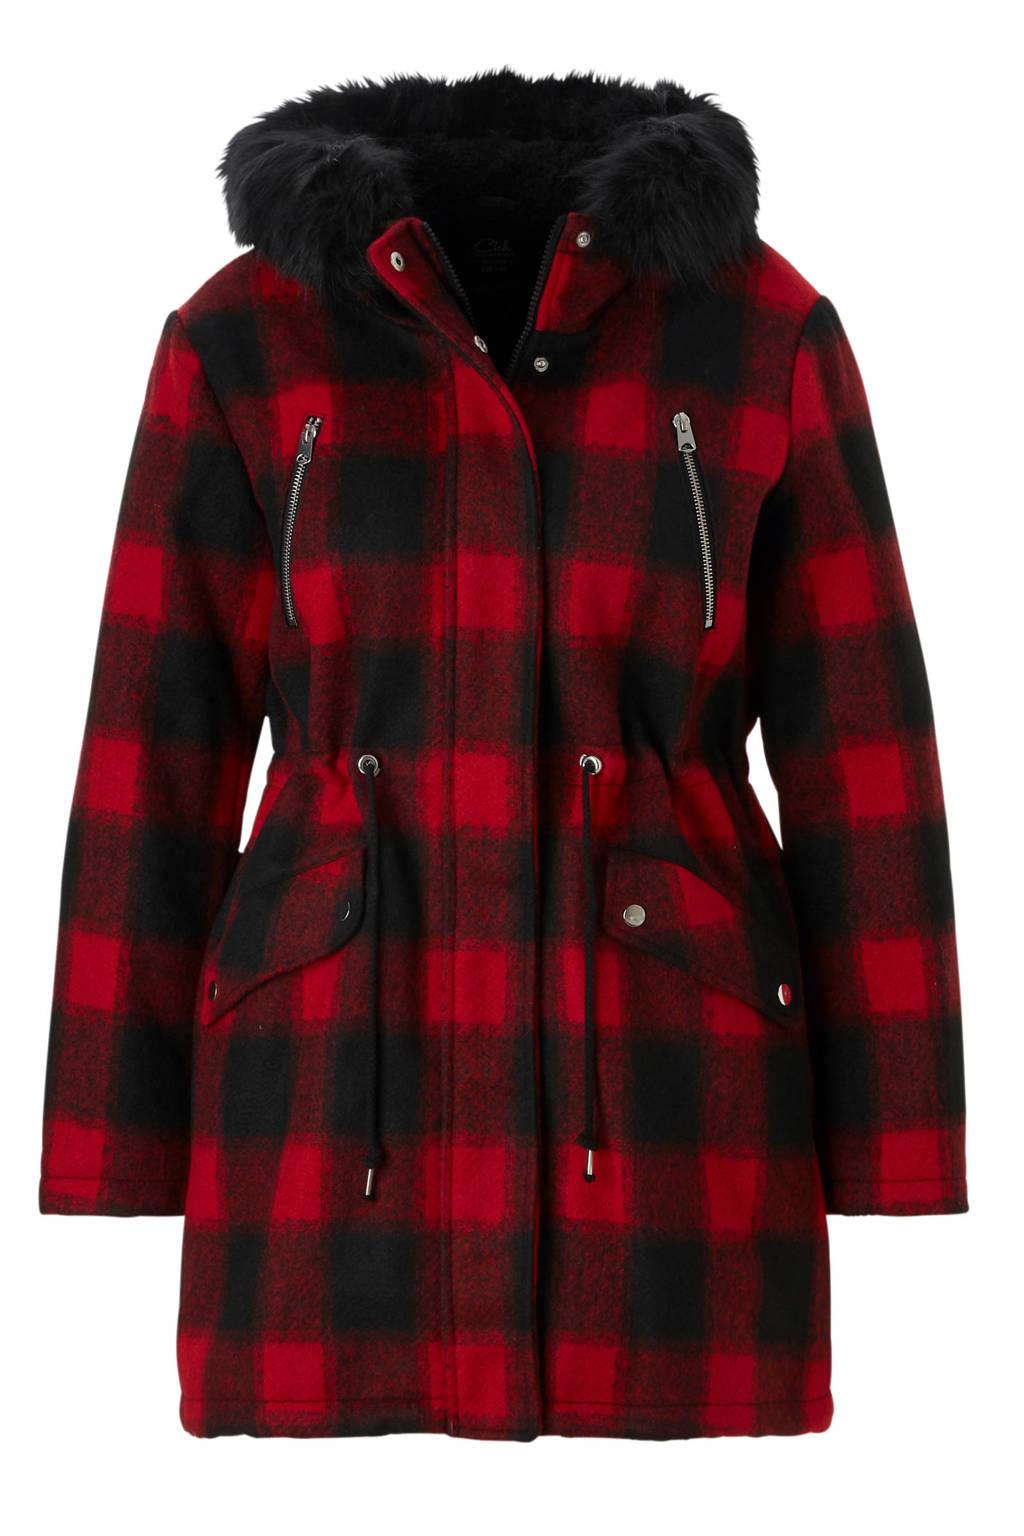 C&A XL Clockhouse geruite coat rood, Rood/zwart